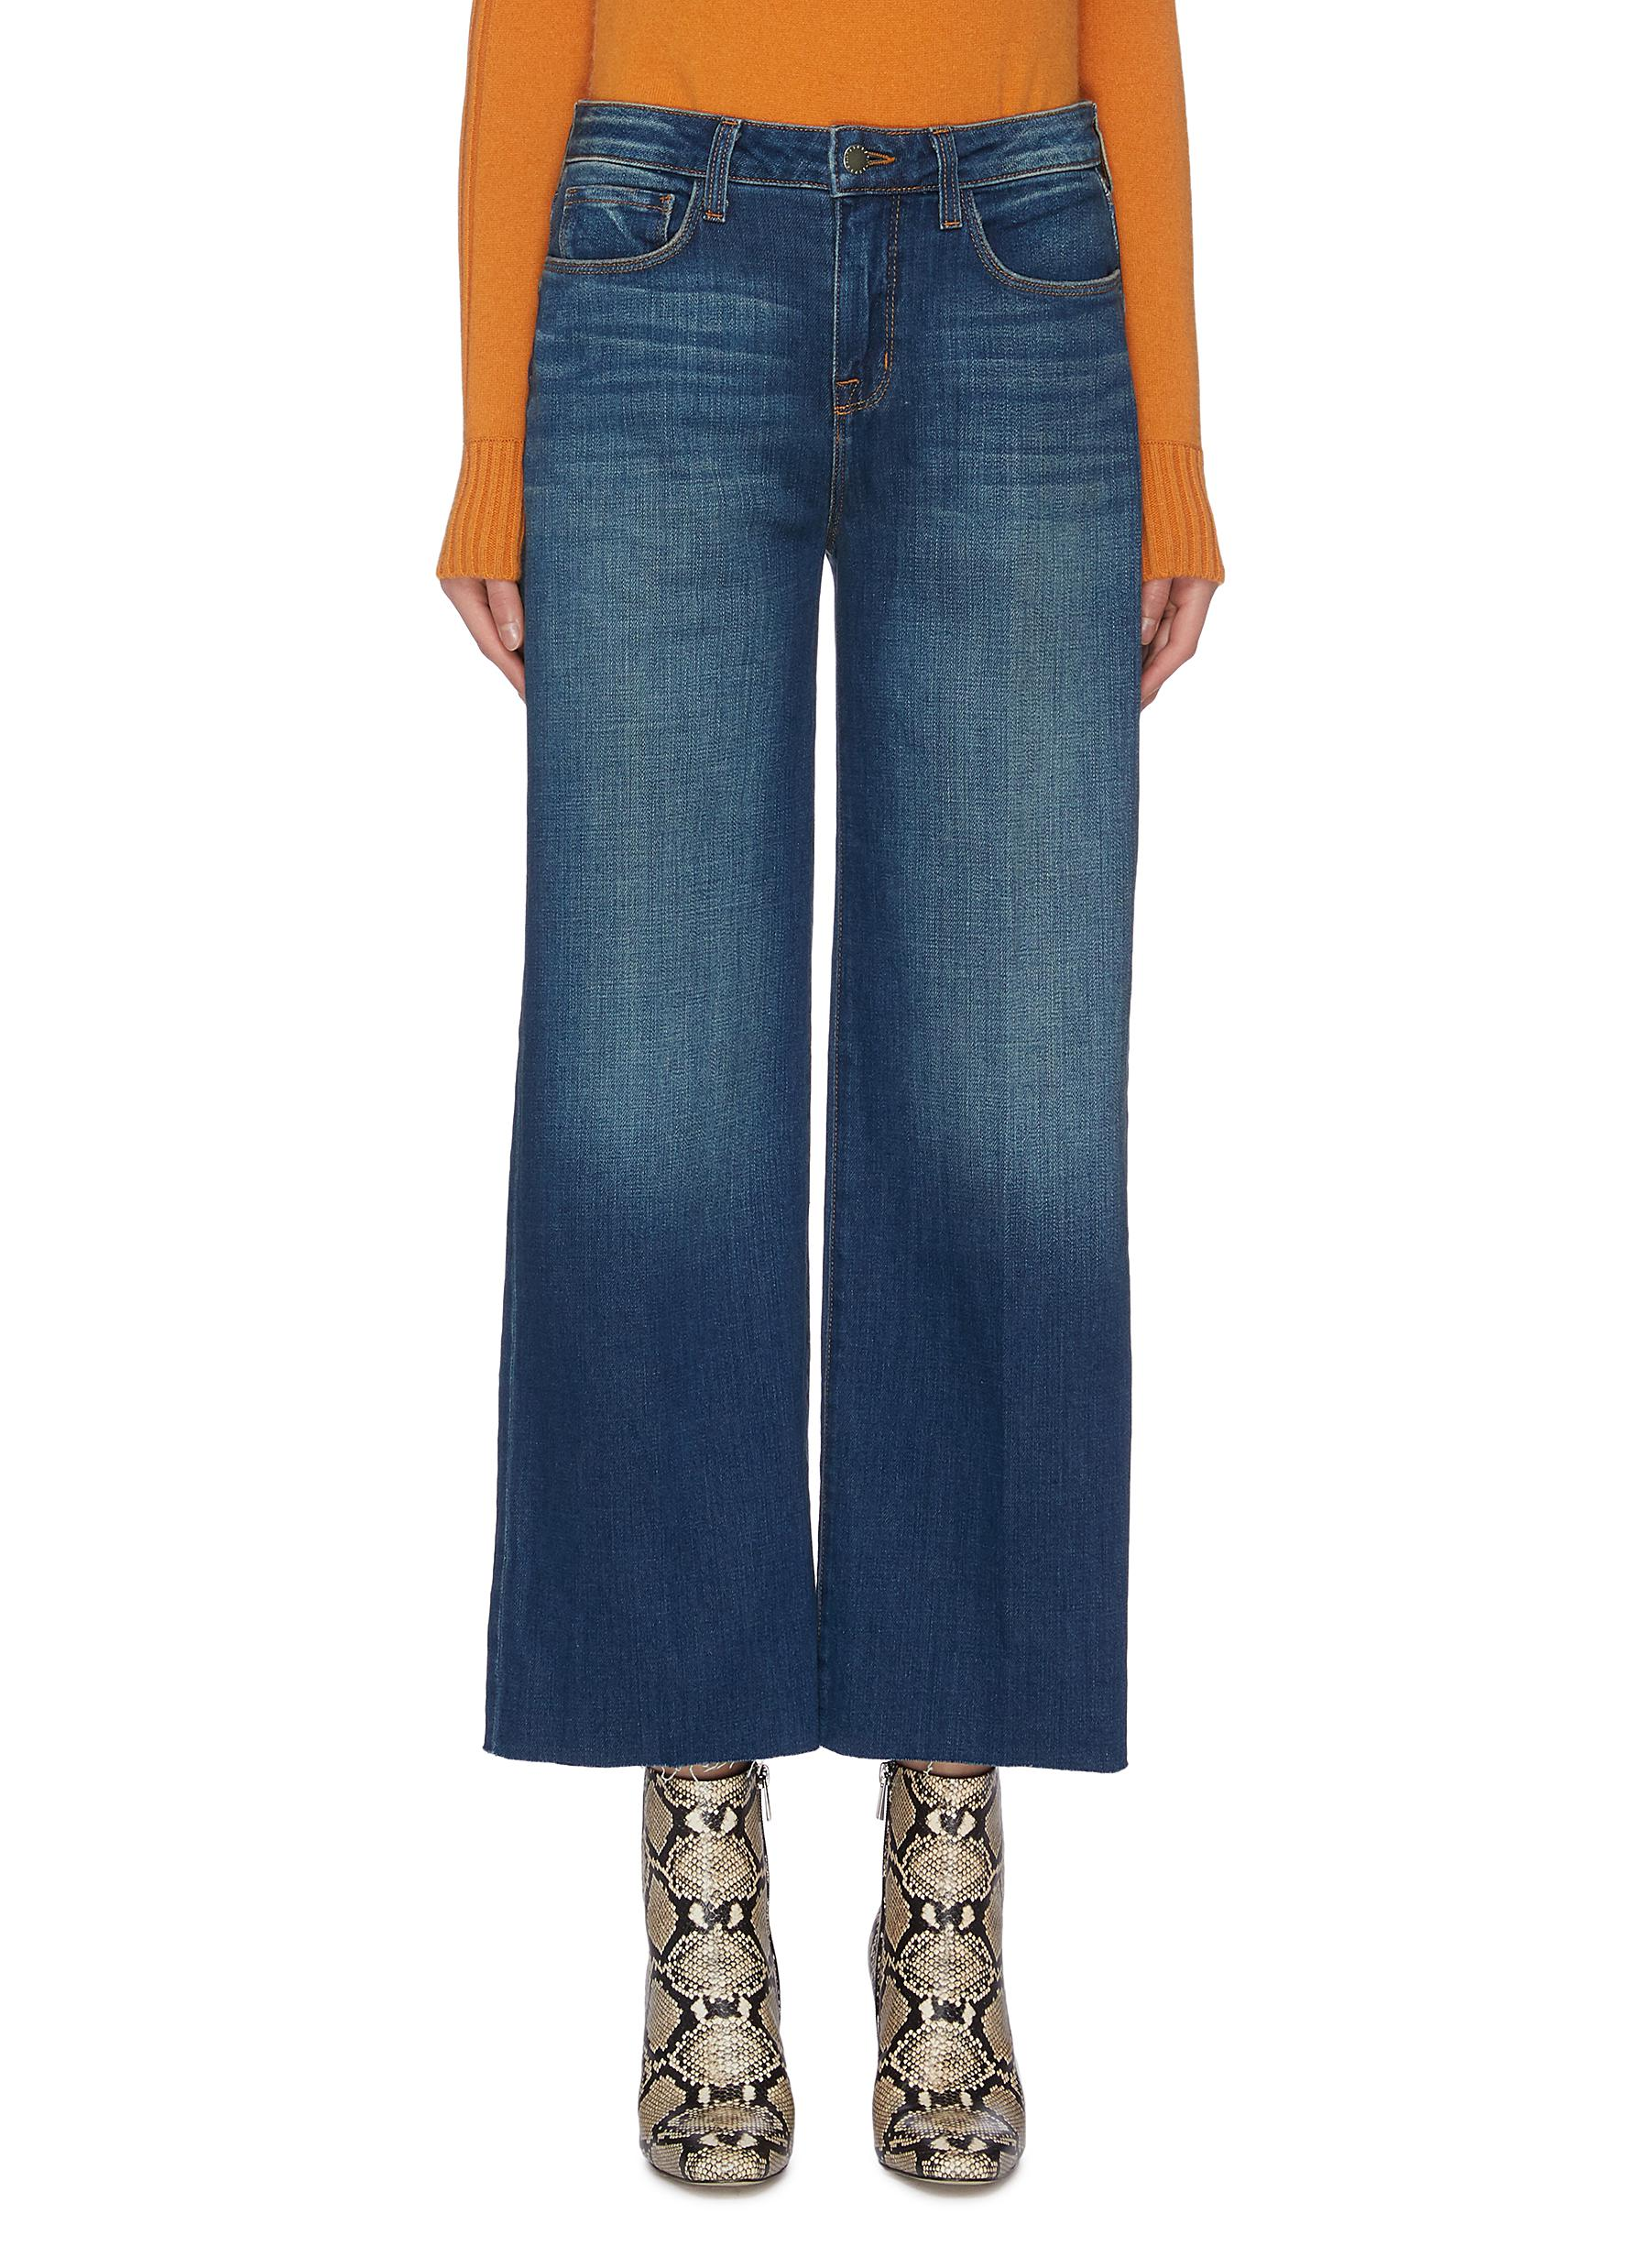 shop L'Agence 'Danica' dark meridian wash jeans online